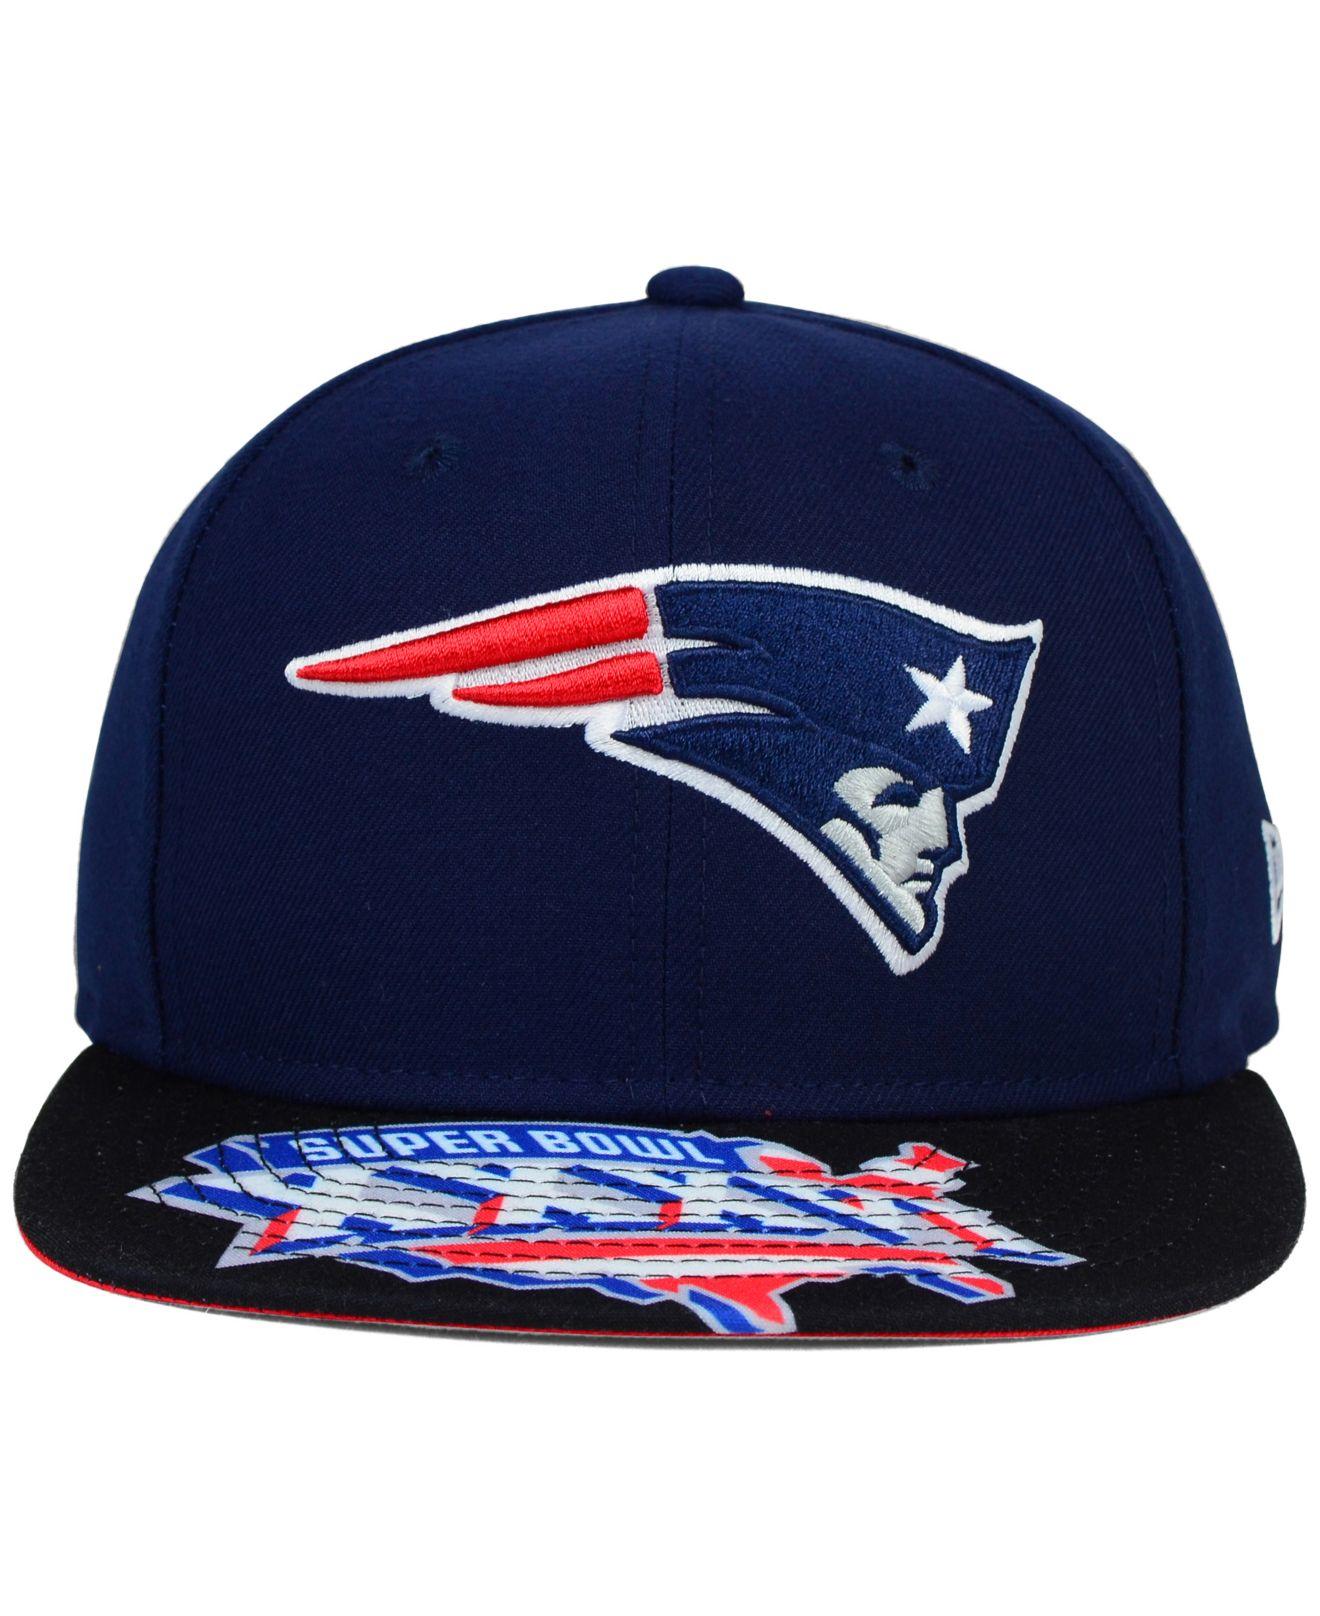 1facafb7388 Lyst - Ktz New England Patriots Super Bowl 50 Jumbo Vize 9fifty ...